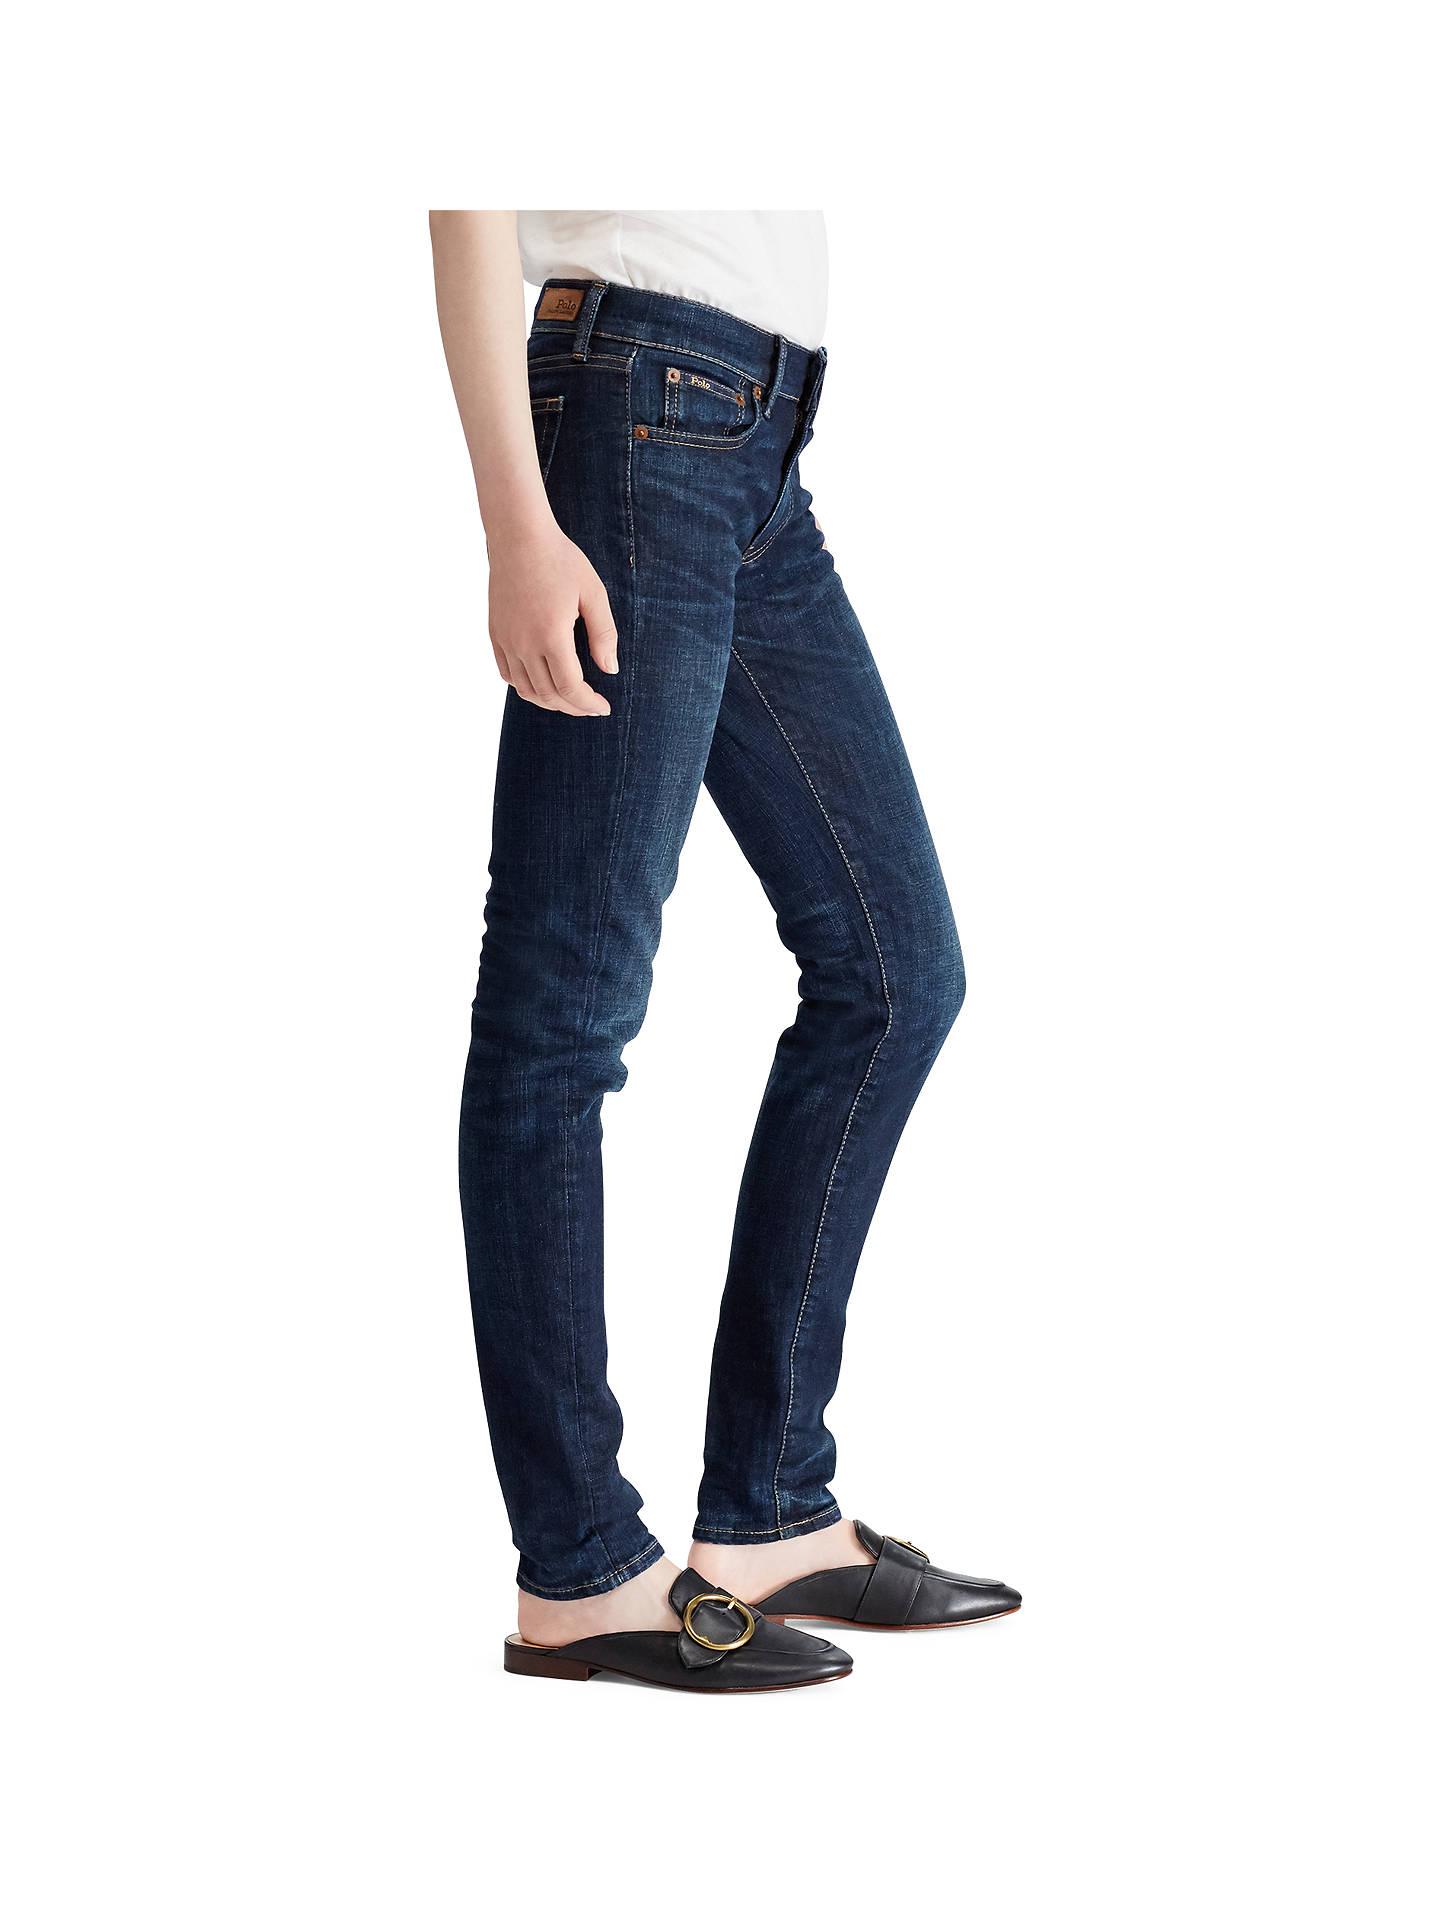 Indigo John Wash Serret Polo Tompkins Skinny Ralph At Jeans Lauren XFWgBT7